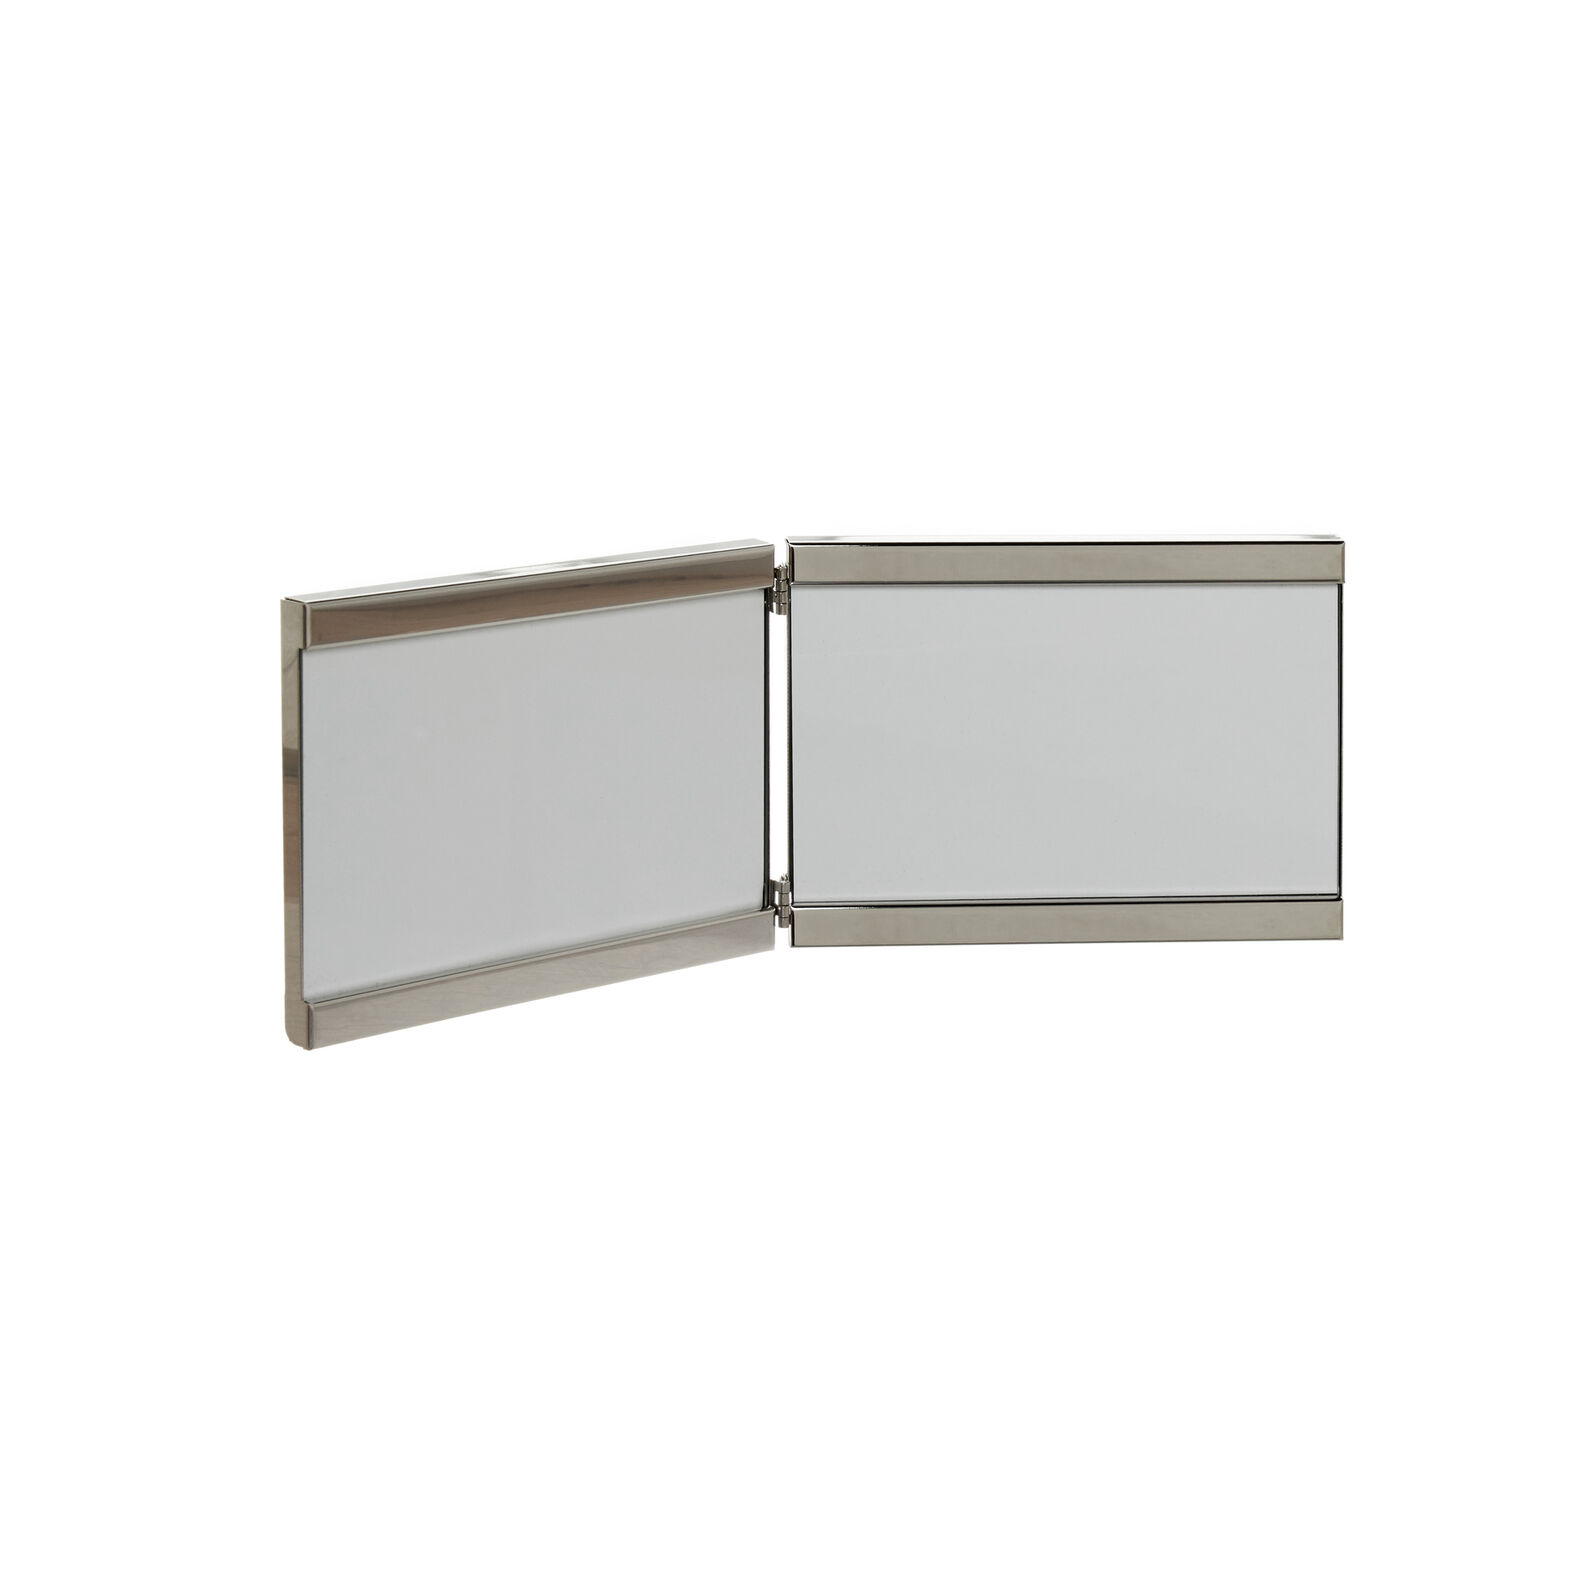 Portafoto silver plated a due frame